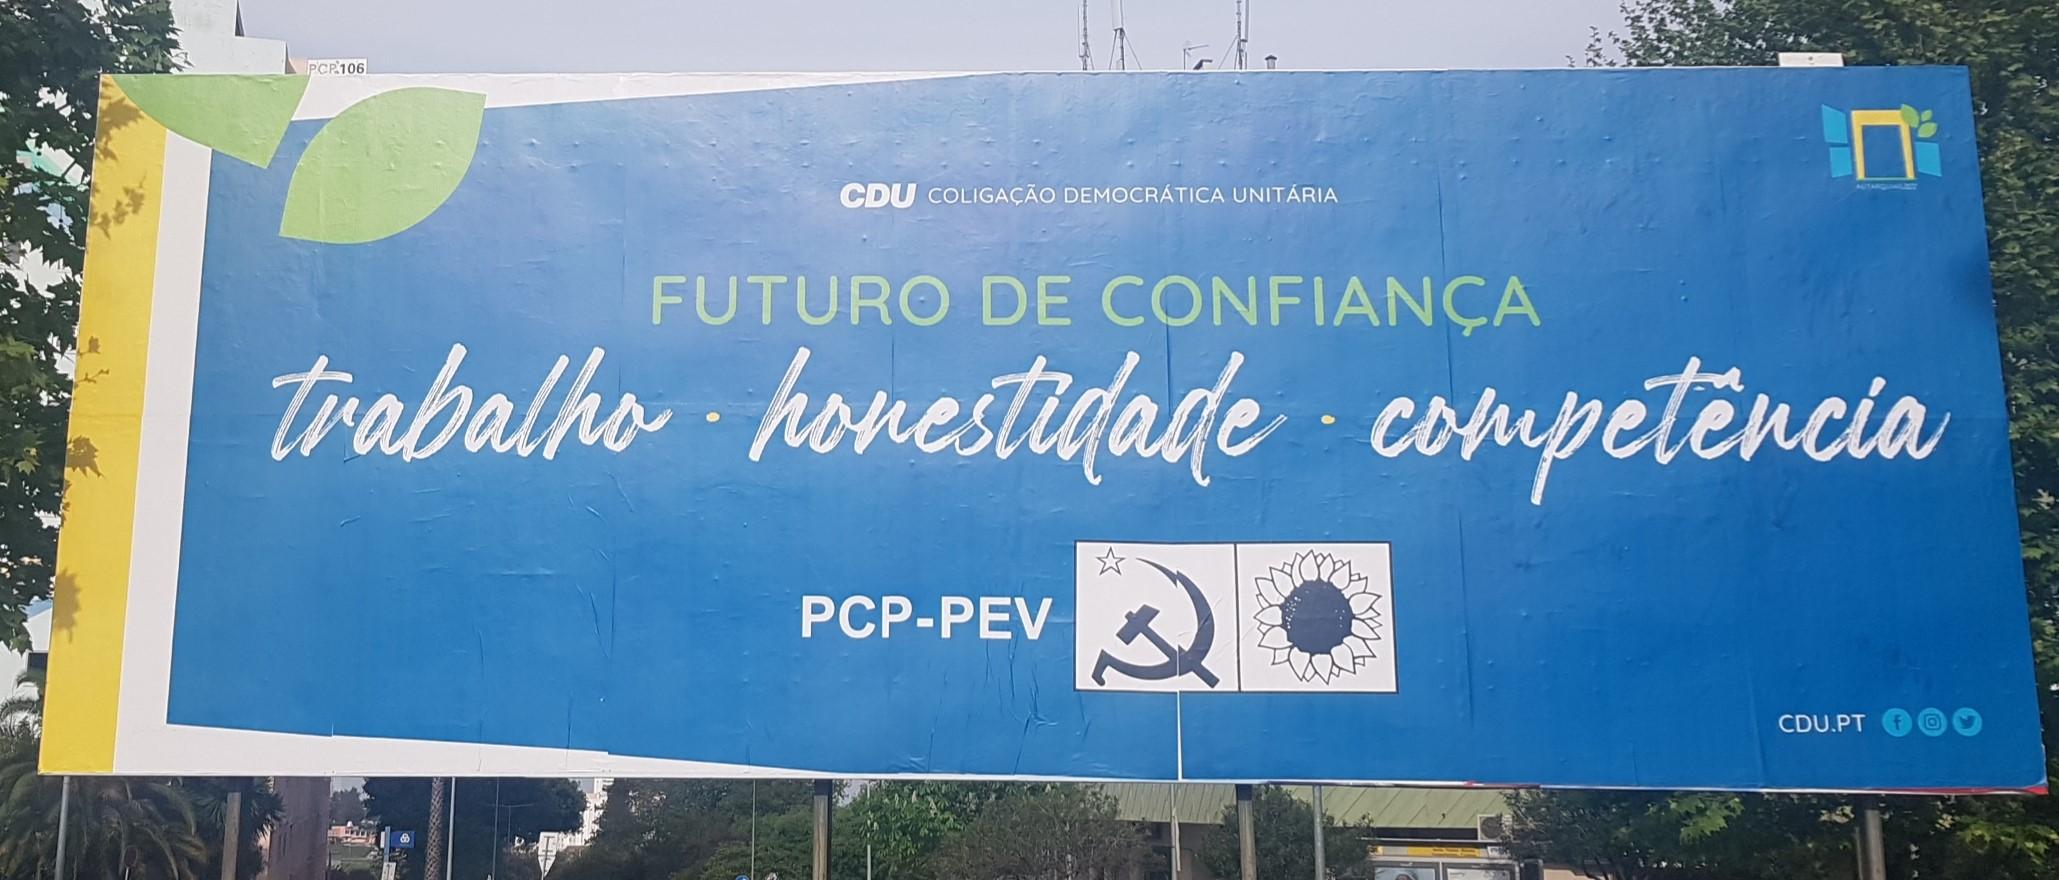 CDU_2021_04